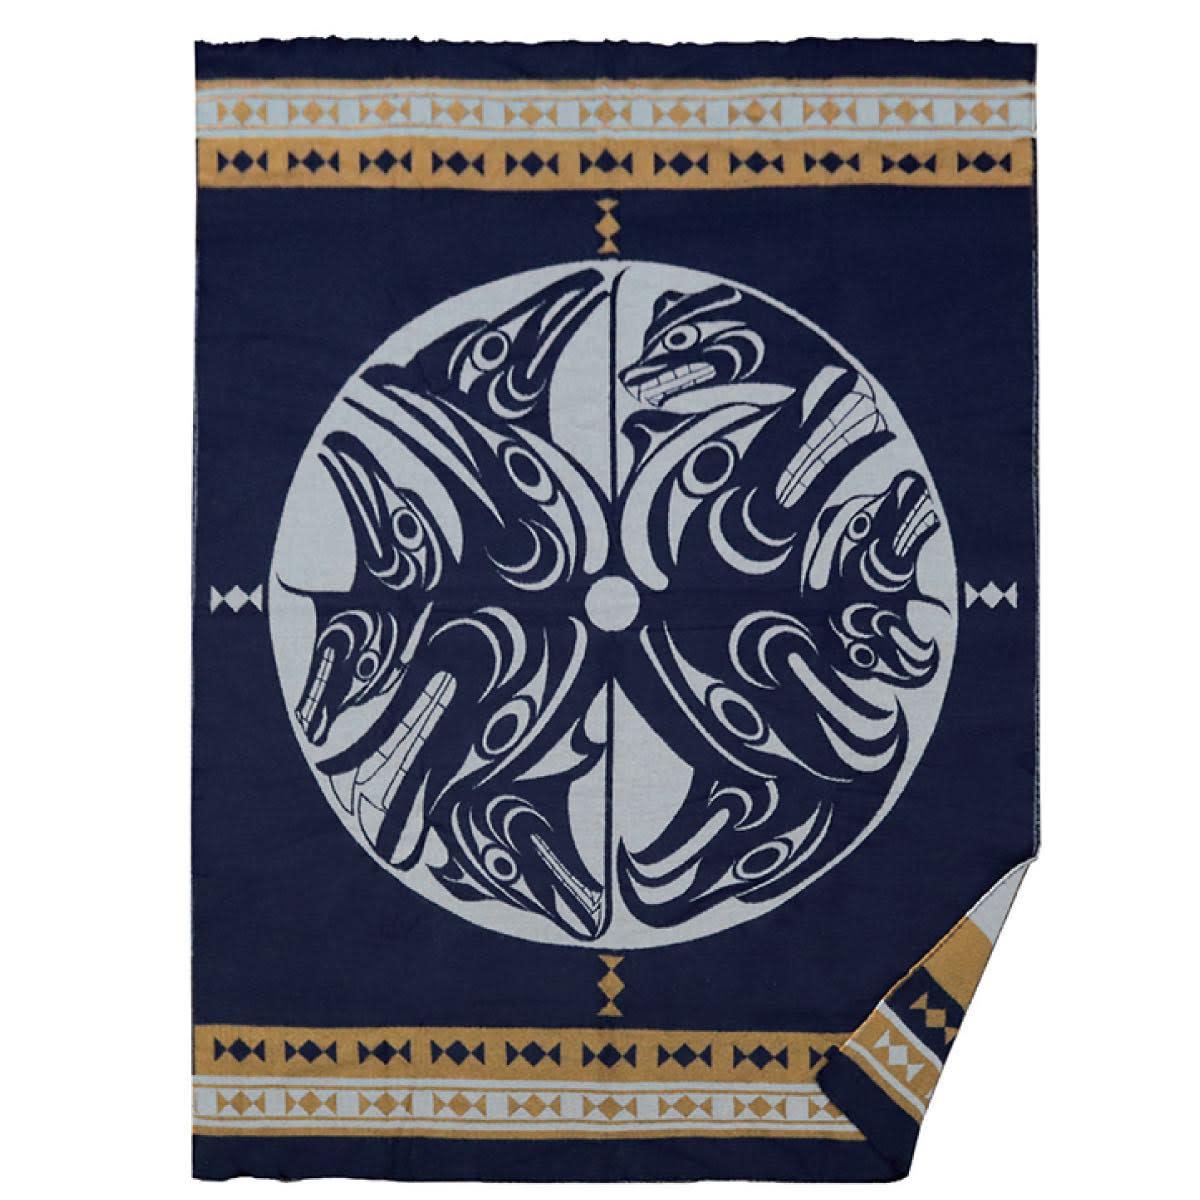 Woven Blanket-Harmony by Francis Horne Sr.-1